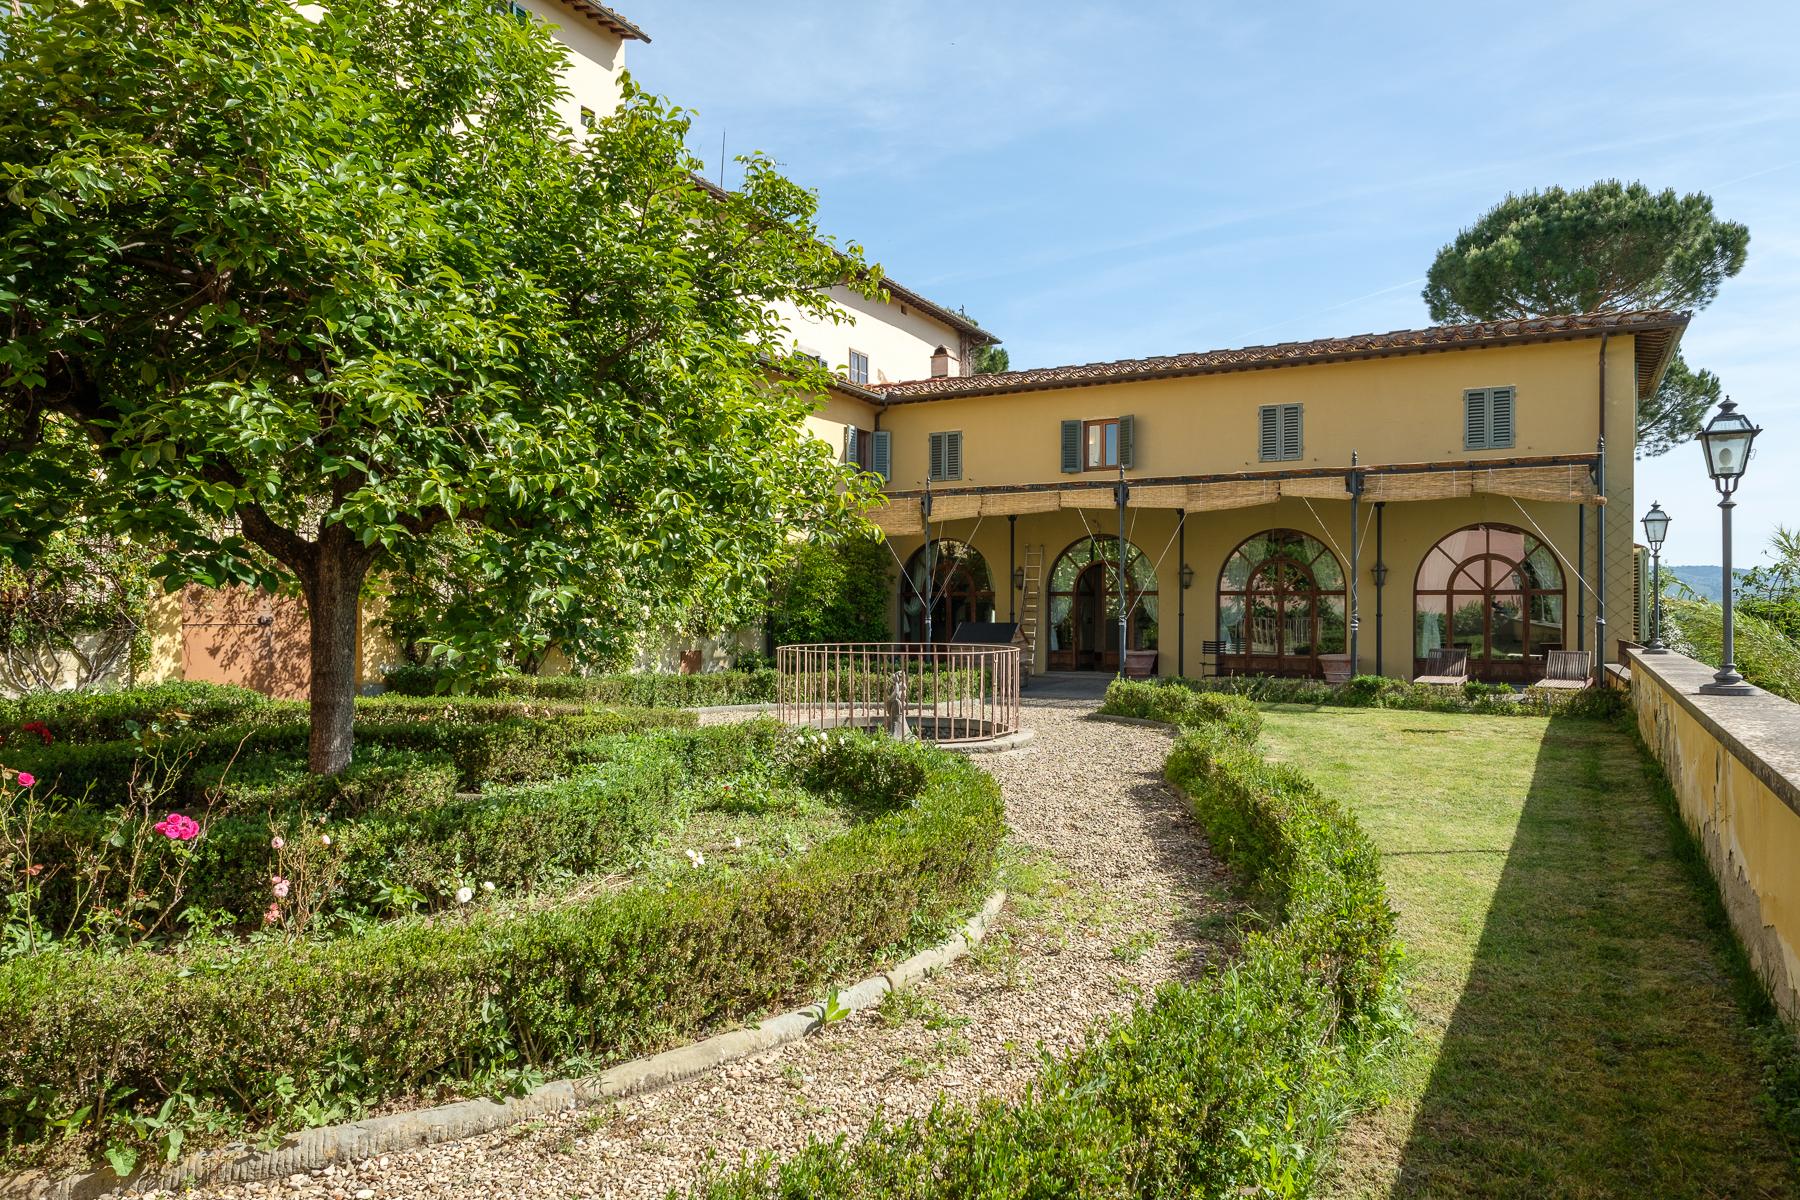 Casa indipendente in Vendita a Firenze Semicentro Ovest: 5 locali, 350 mq